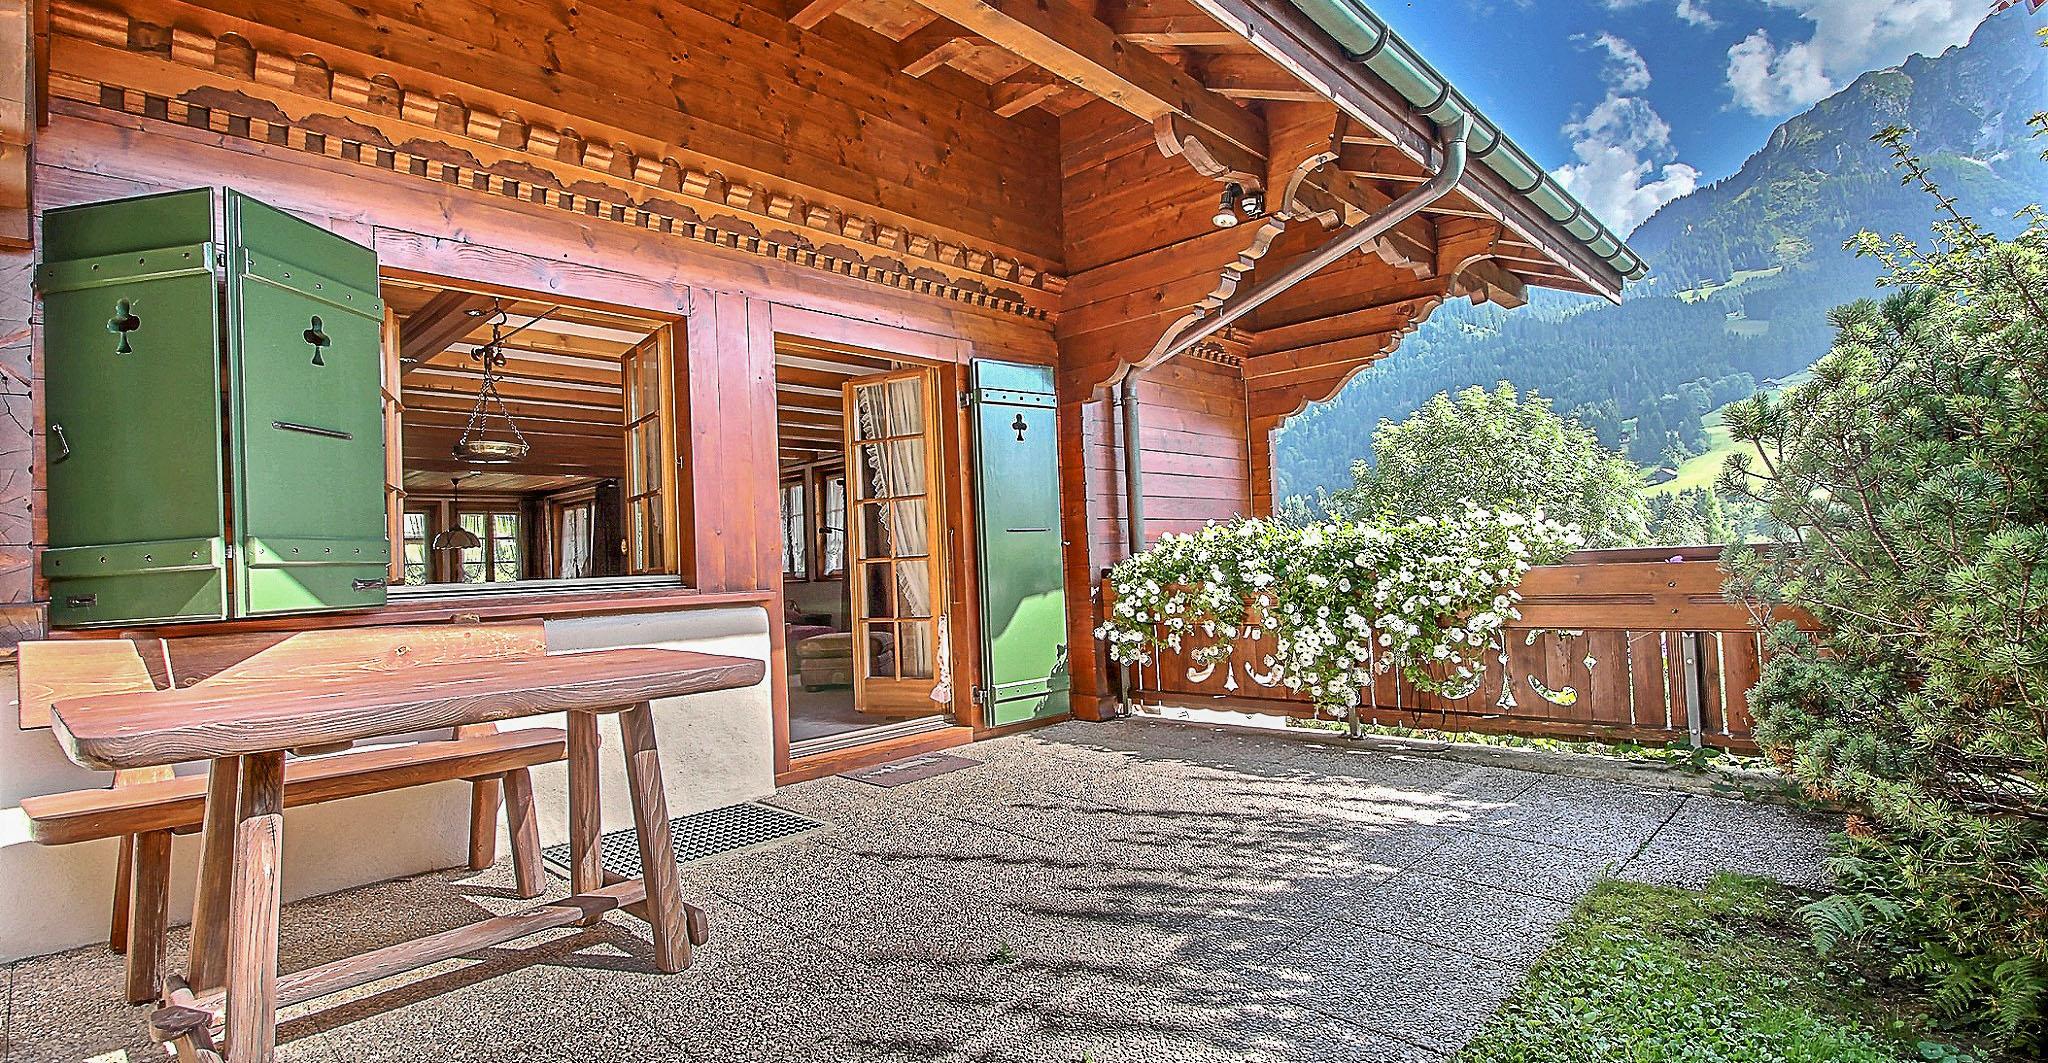 Chalet Juillet Chalet, Switzerland